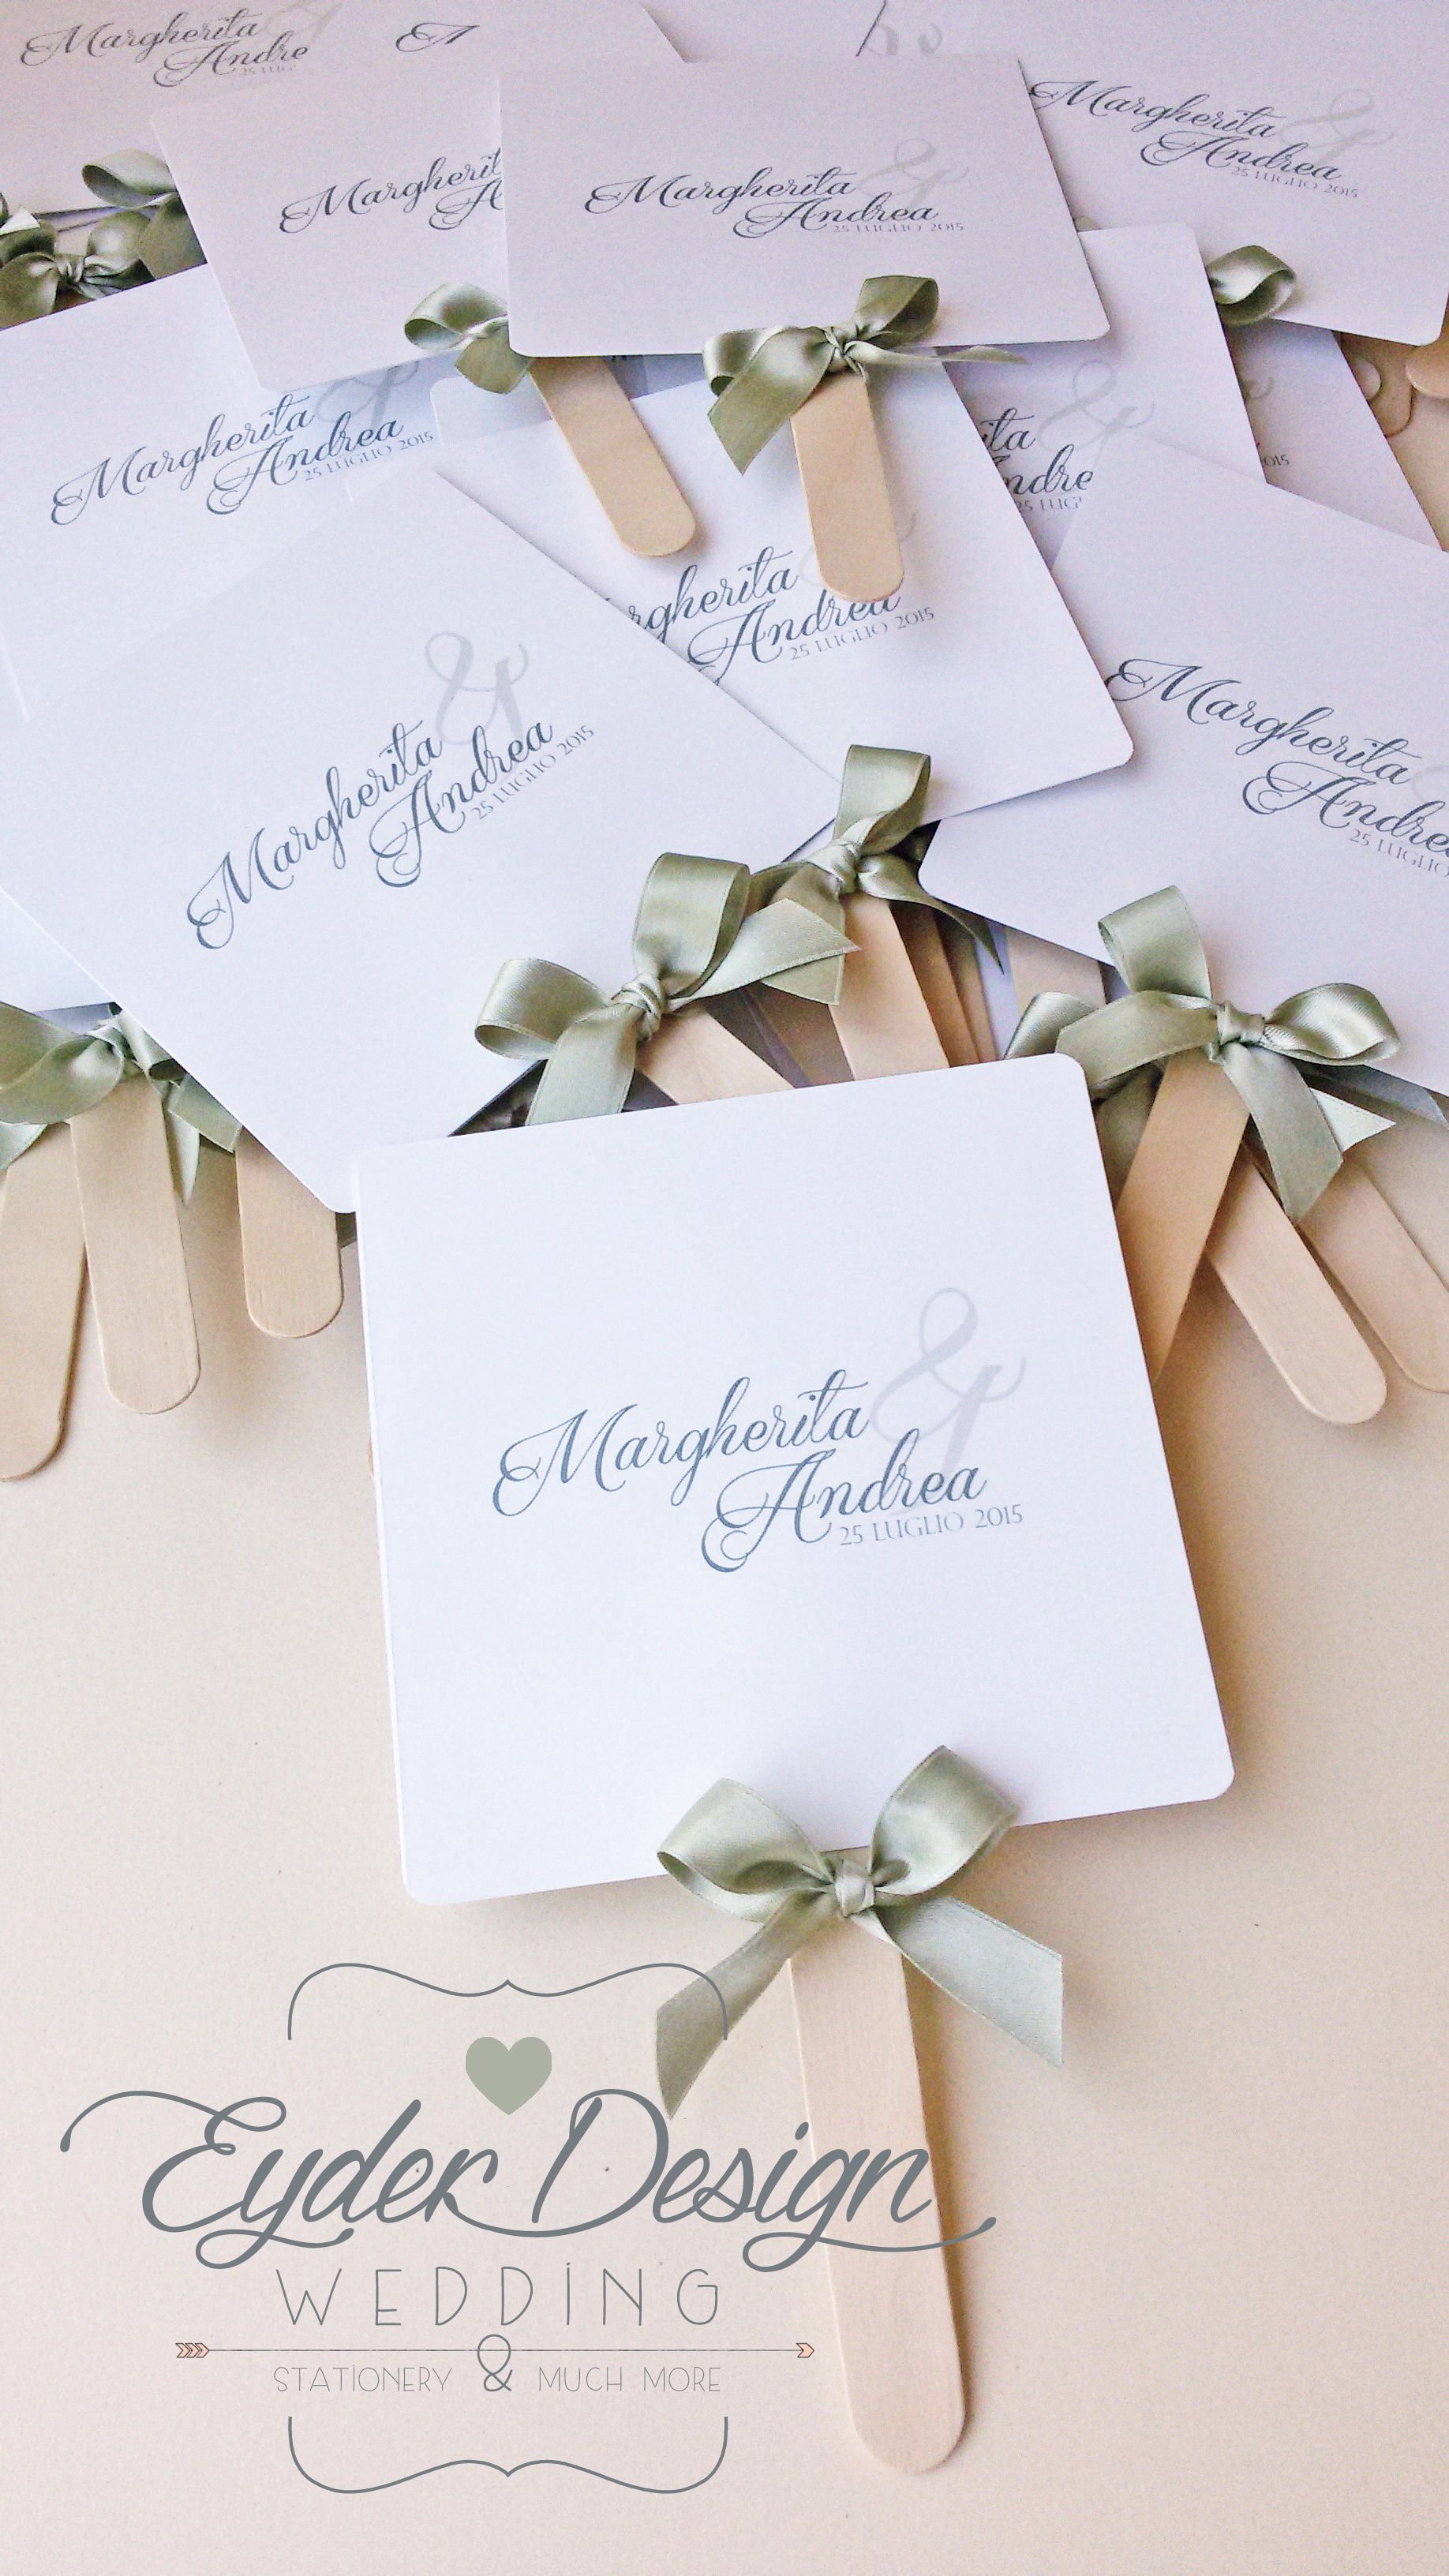 Molto Ventagli | wedding | Pinterest | Wedding, Wedding planer and Green  TT03